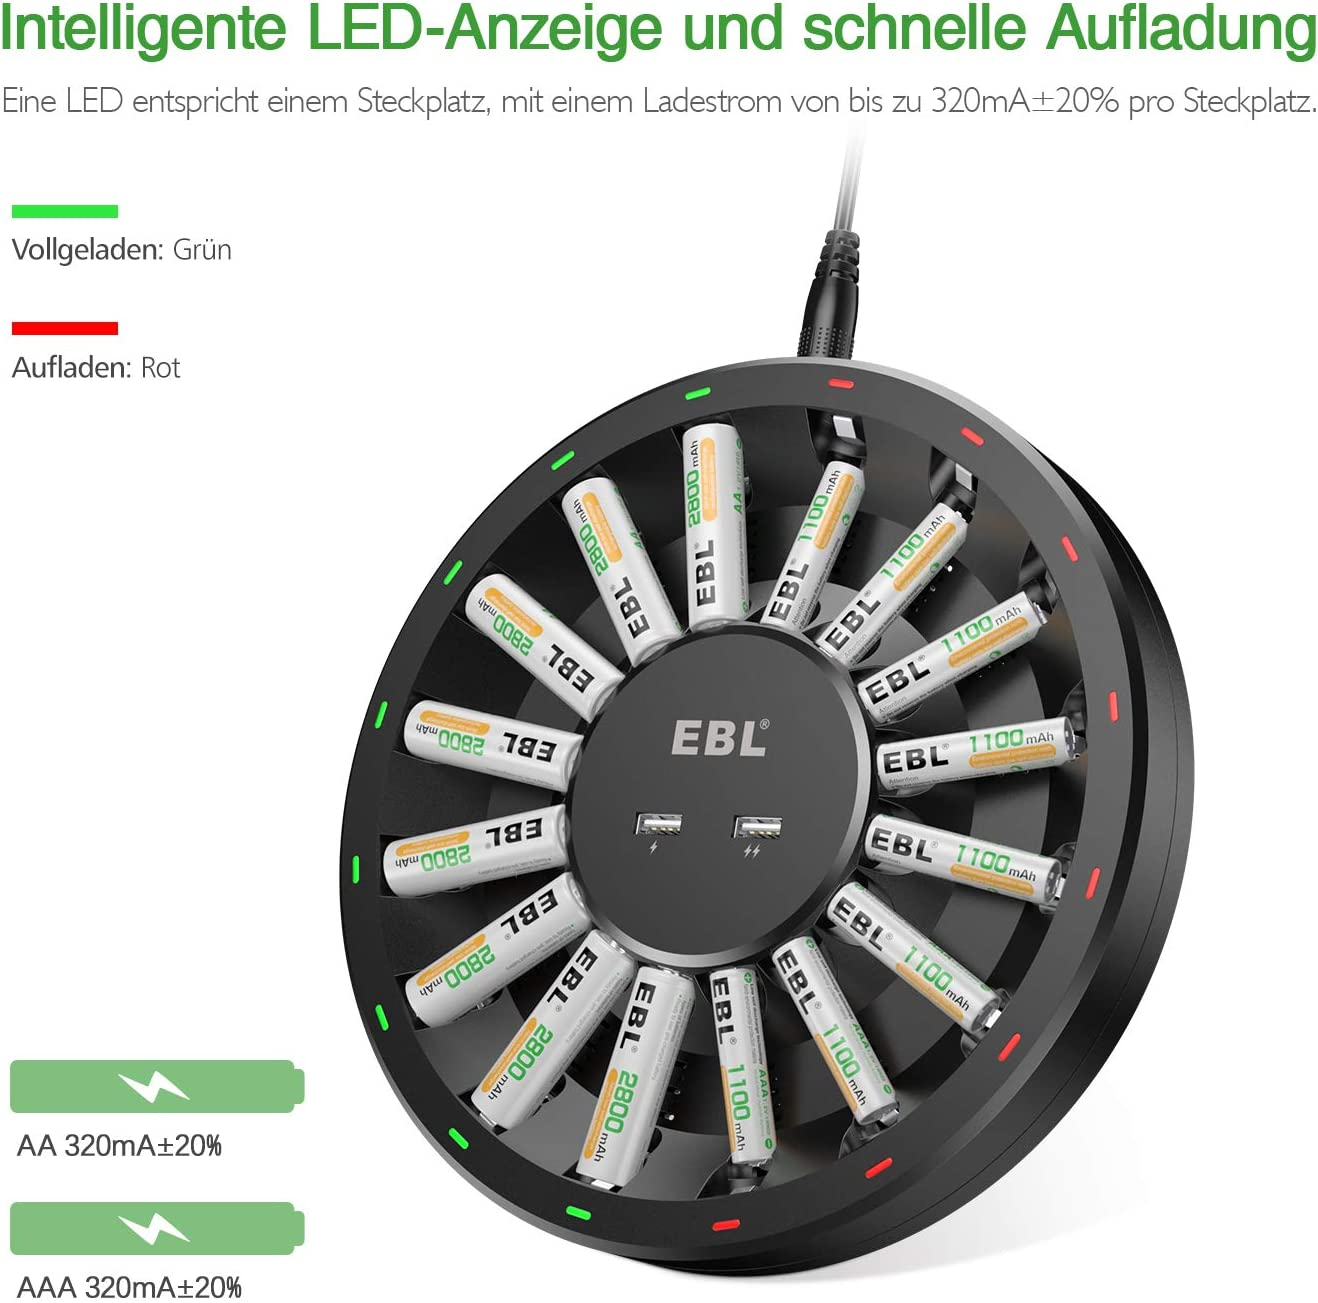 individuelles Akkuladeger/ät f/ür AA AAA Akkus und USB Ger/äte 2-USB Outports EBL Batterieladeger/ät 16 Fach LED Anzeige